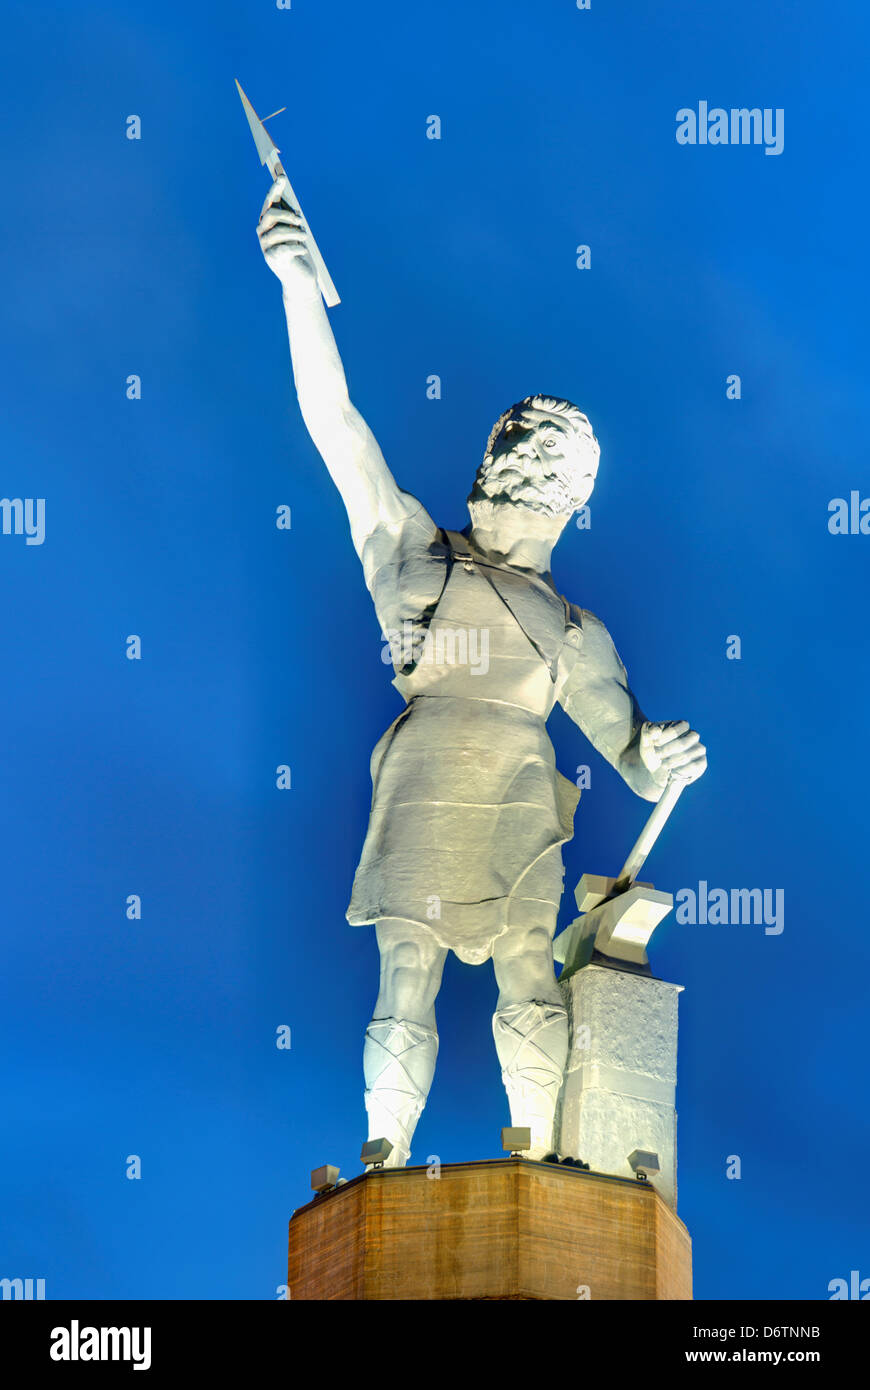 USA, Alabama, Birmingham, Vulcan statue Stock Photo